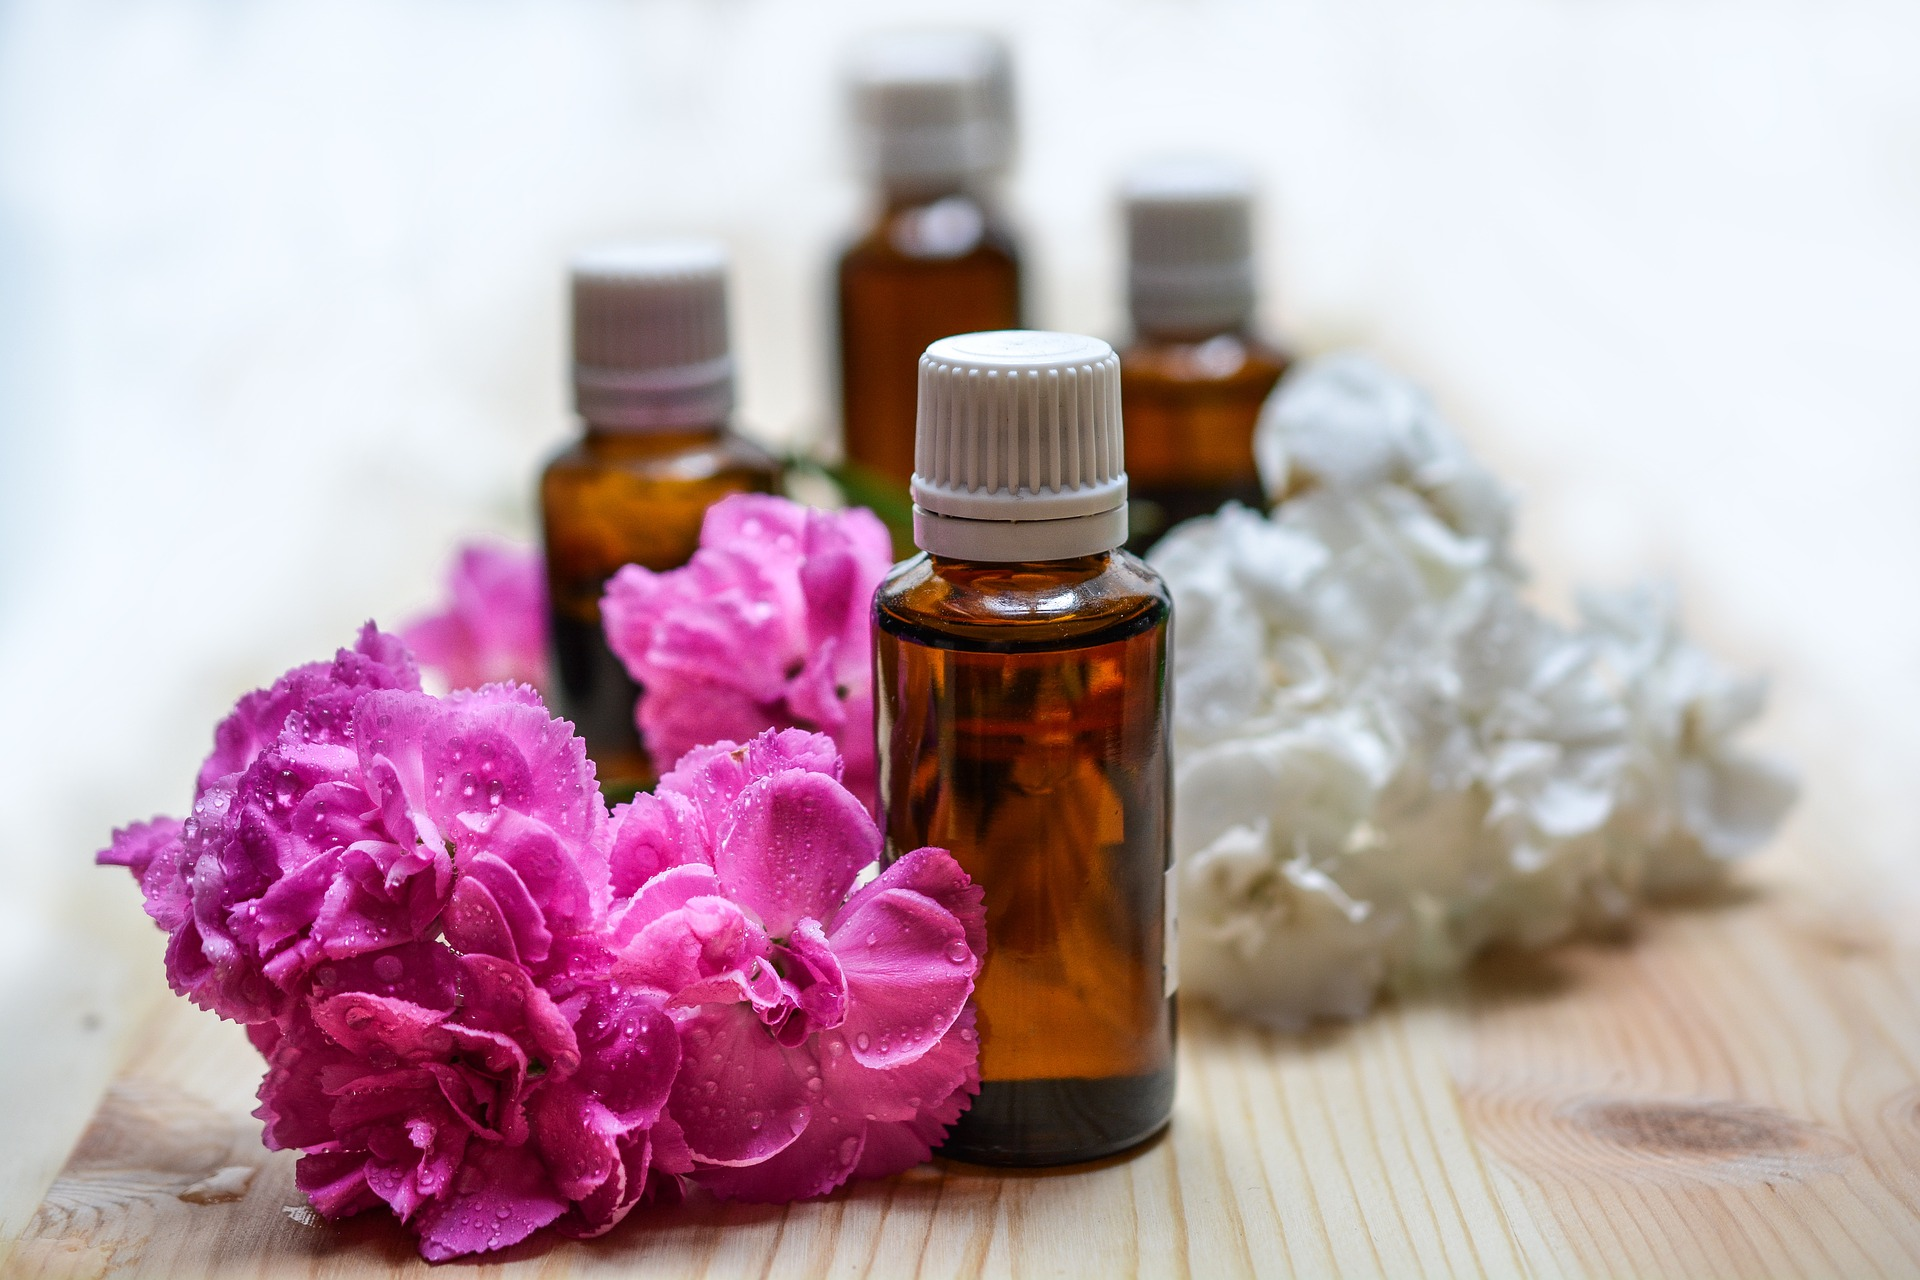 essential-oils-1433694_1920 (1).jpg